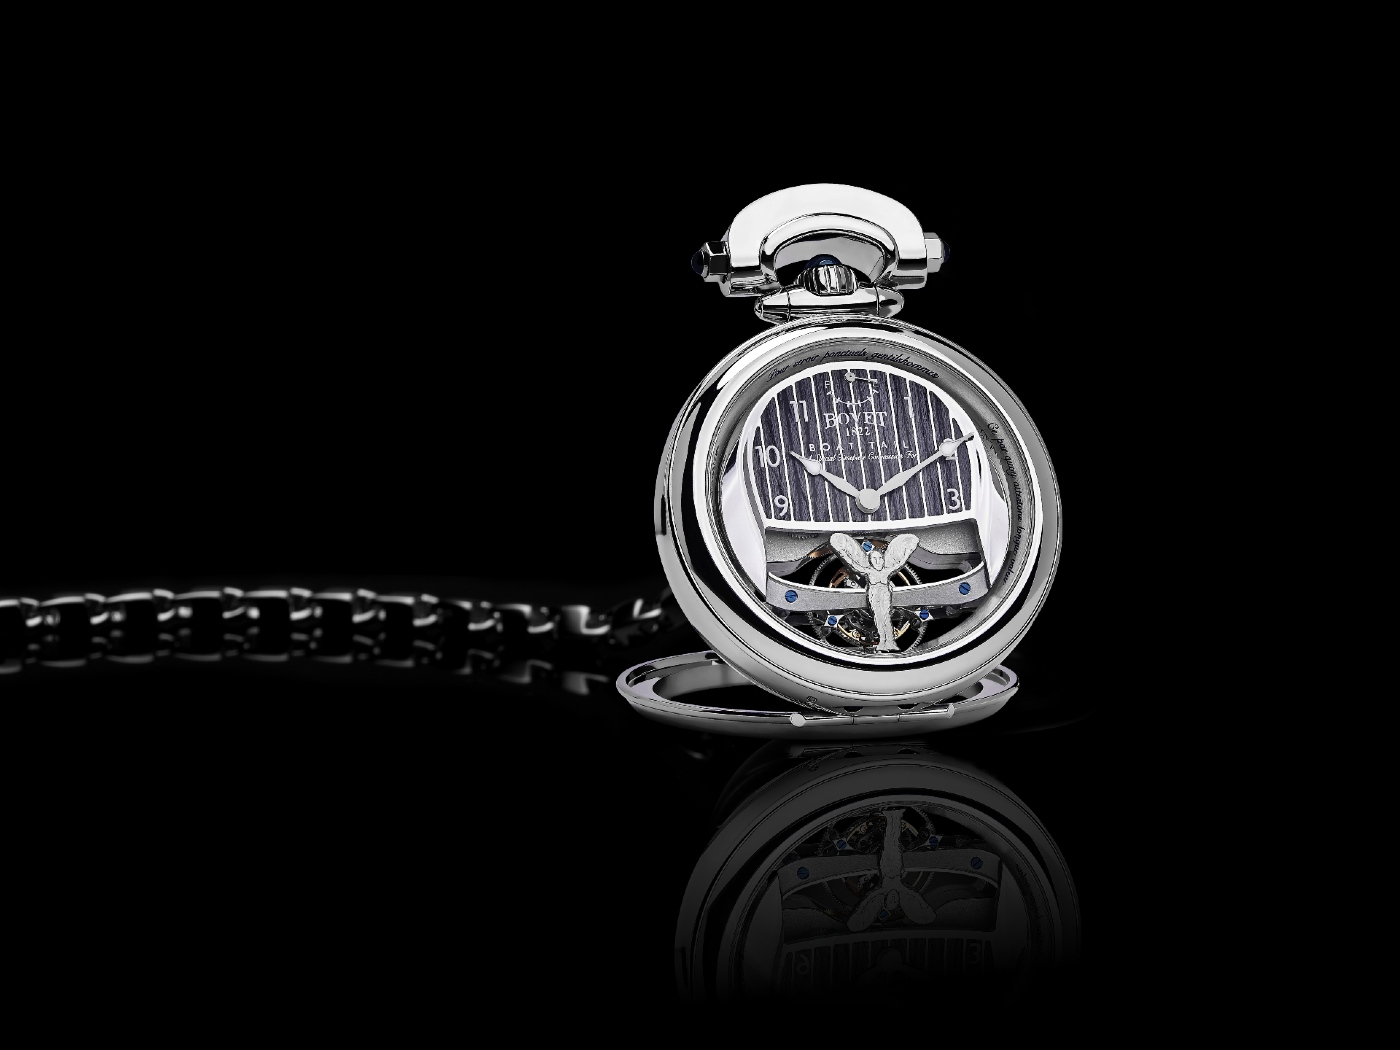 Bespoke timepiece 1